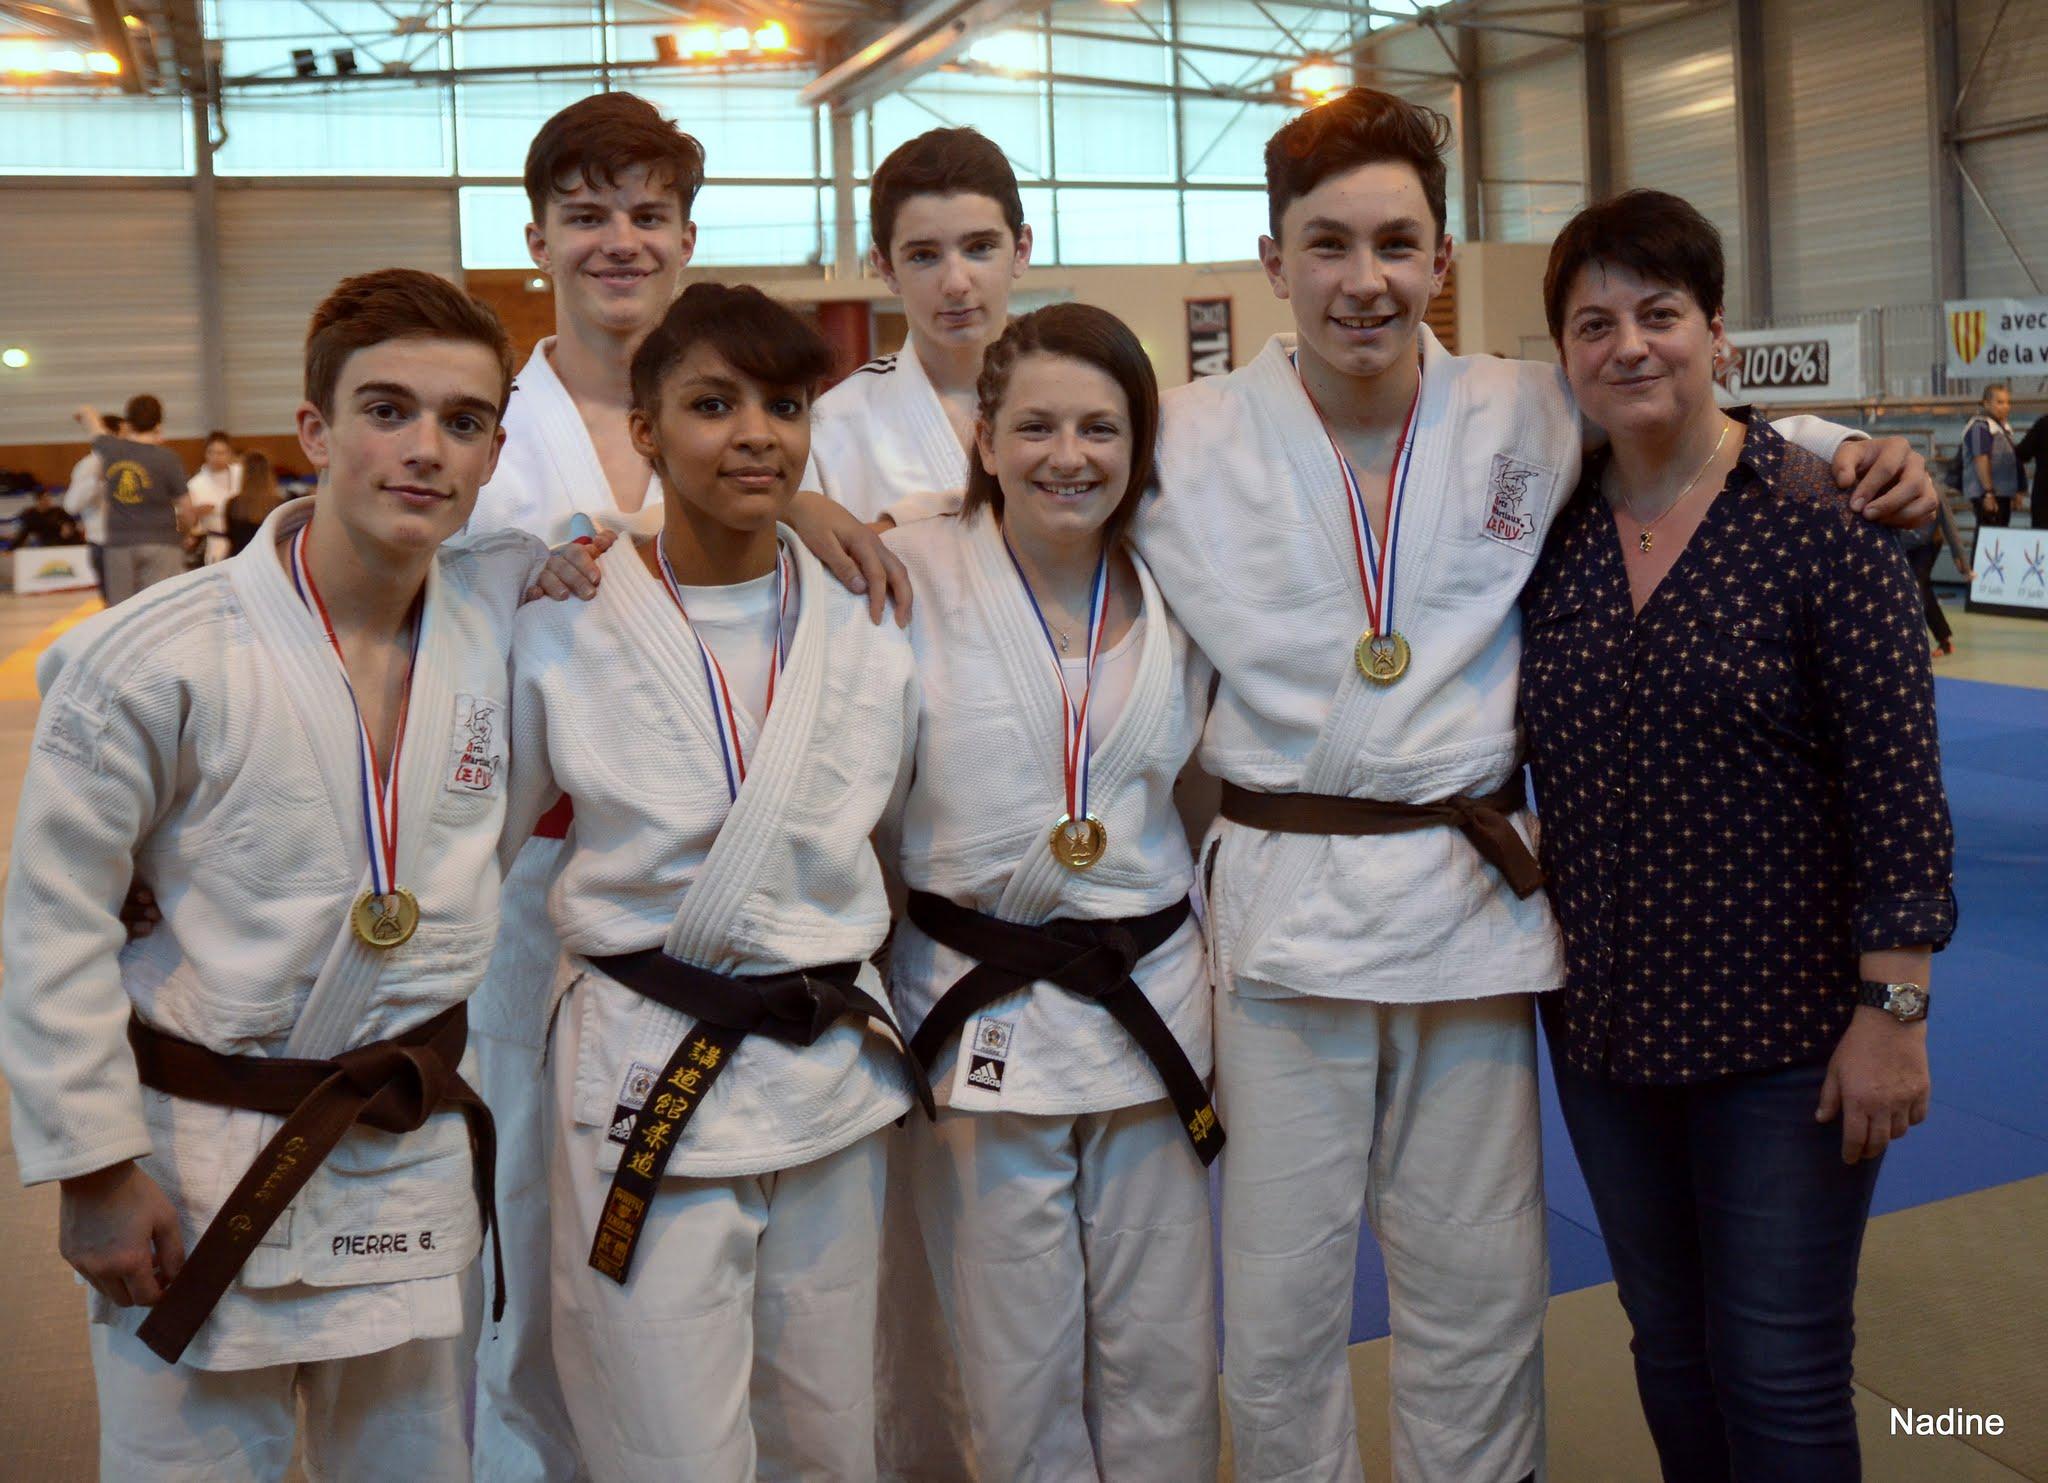 Championnats de France Jujitsu 2016